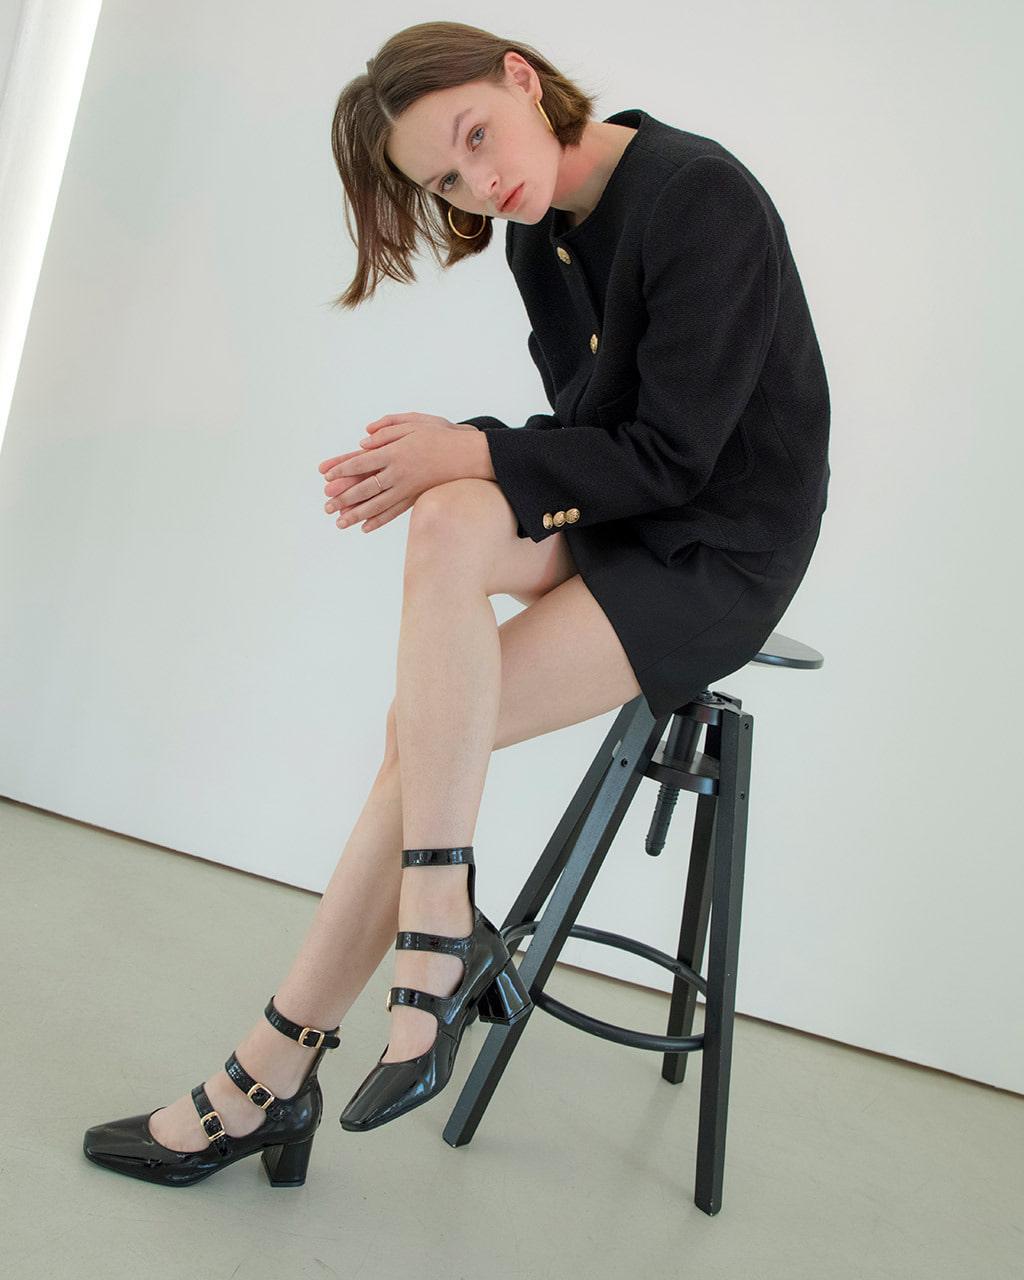 ddtt Hart DT-S2101 Black - Women's Shoes : China